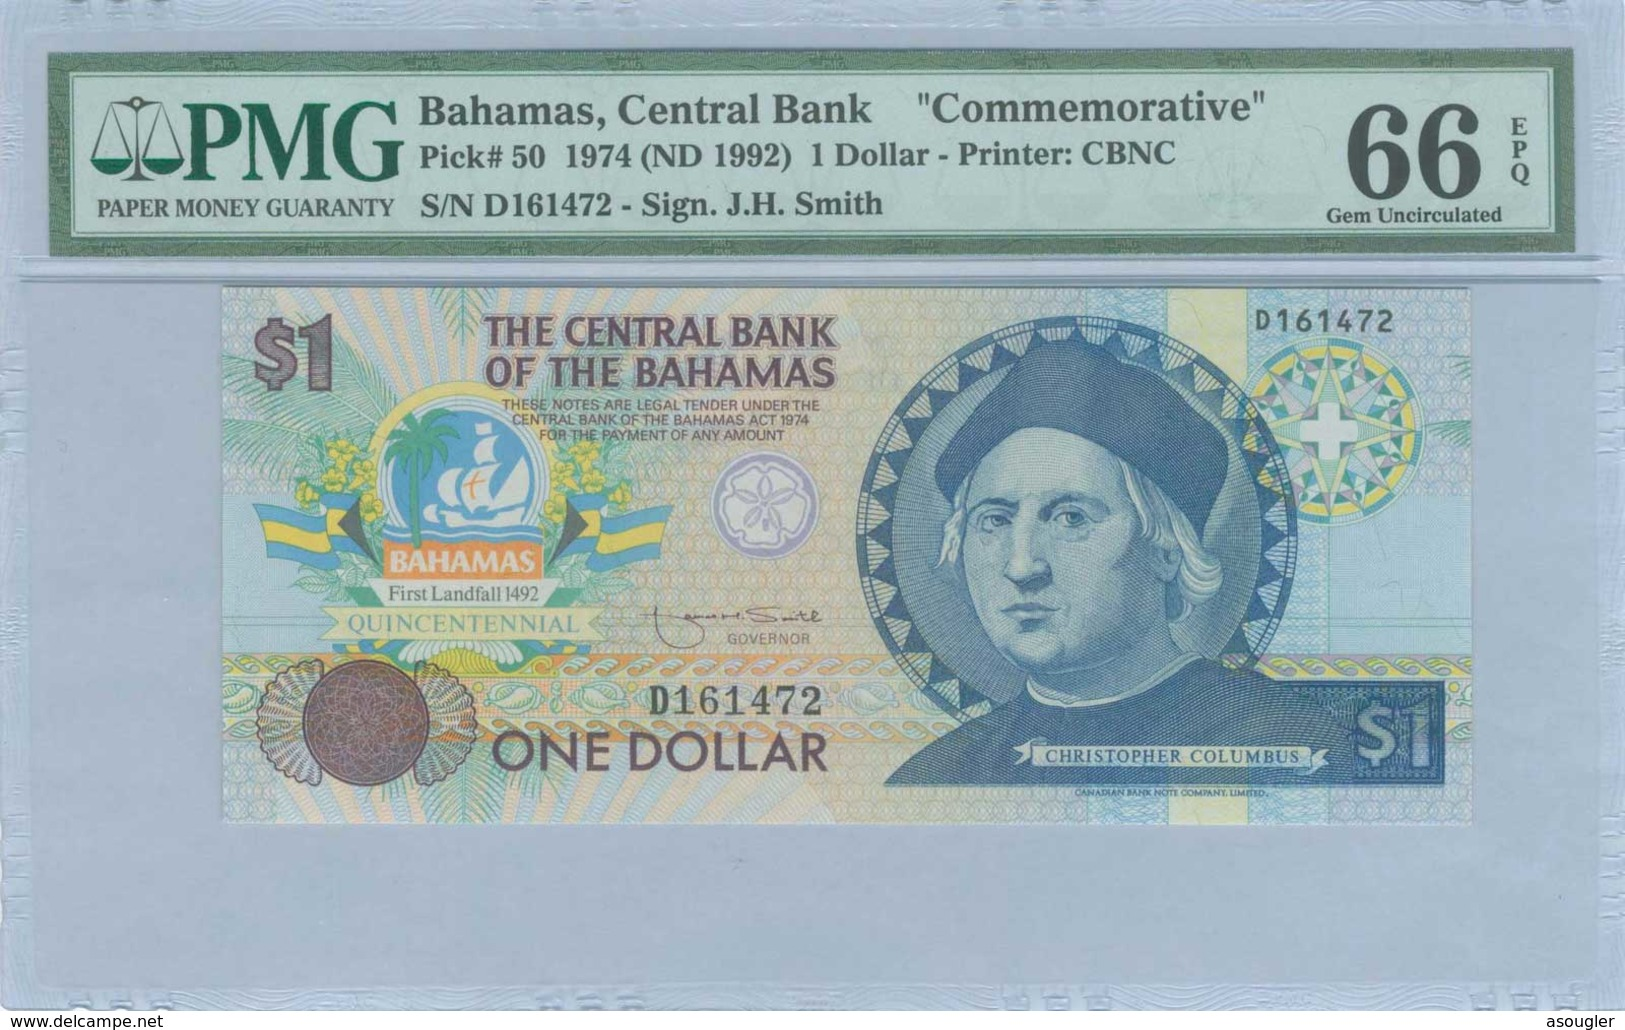 BAHAMAS: 1 Dollar (ND 1992) PMG 66 EPQ - Bahamas